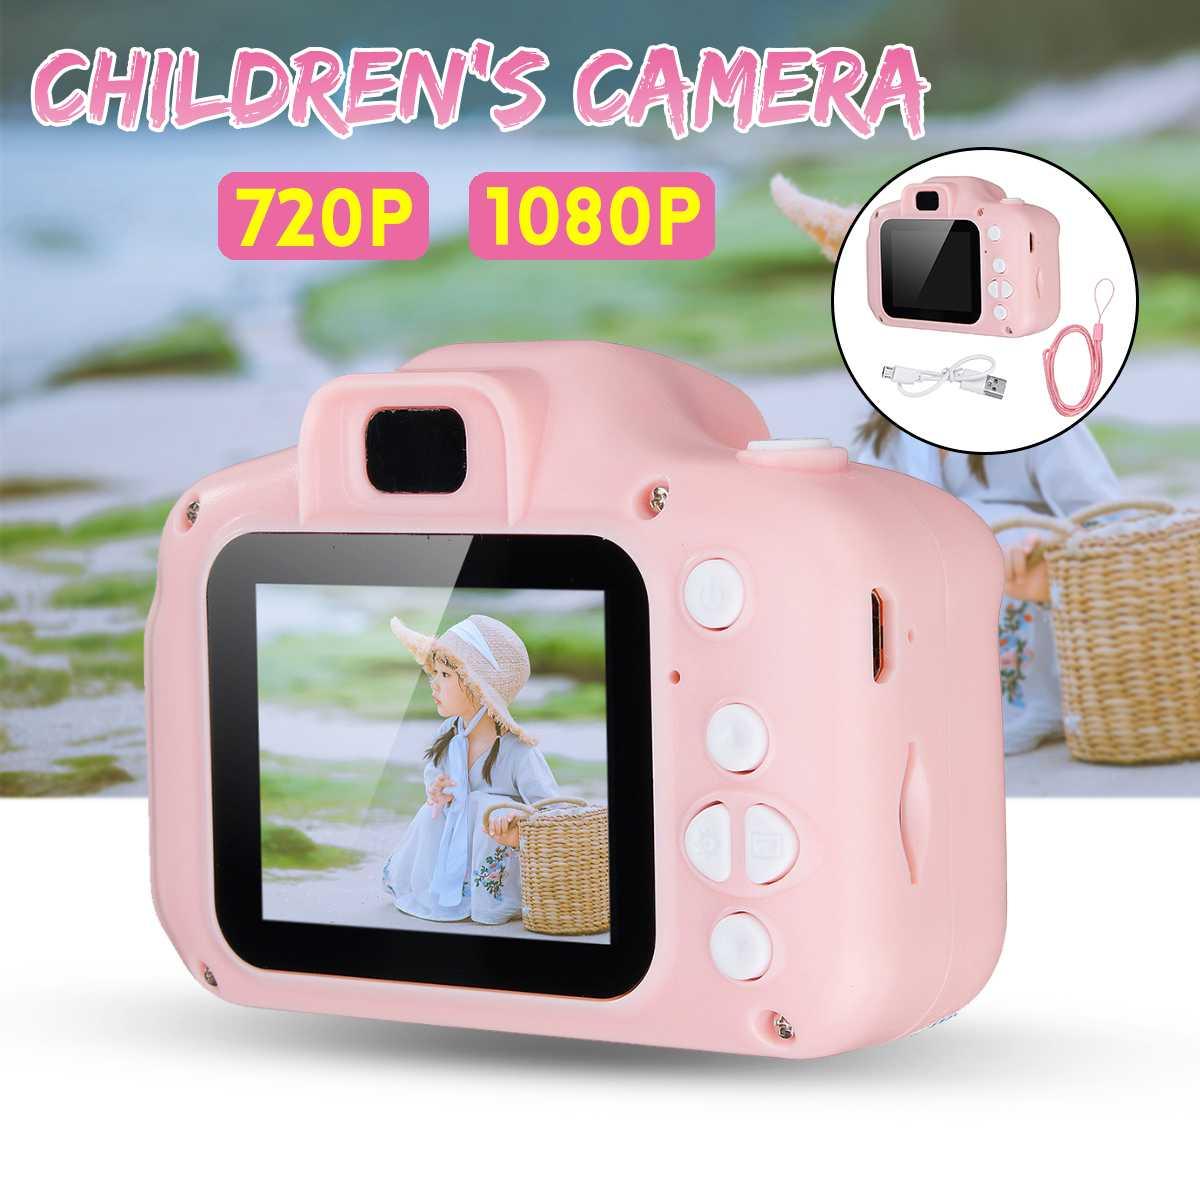 720P/1080P Children Mini Camera Kids Educational Toys For Children Birthday Gift Digital Camera 1080P Projection Video Camera